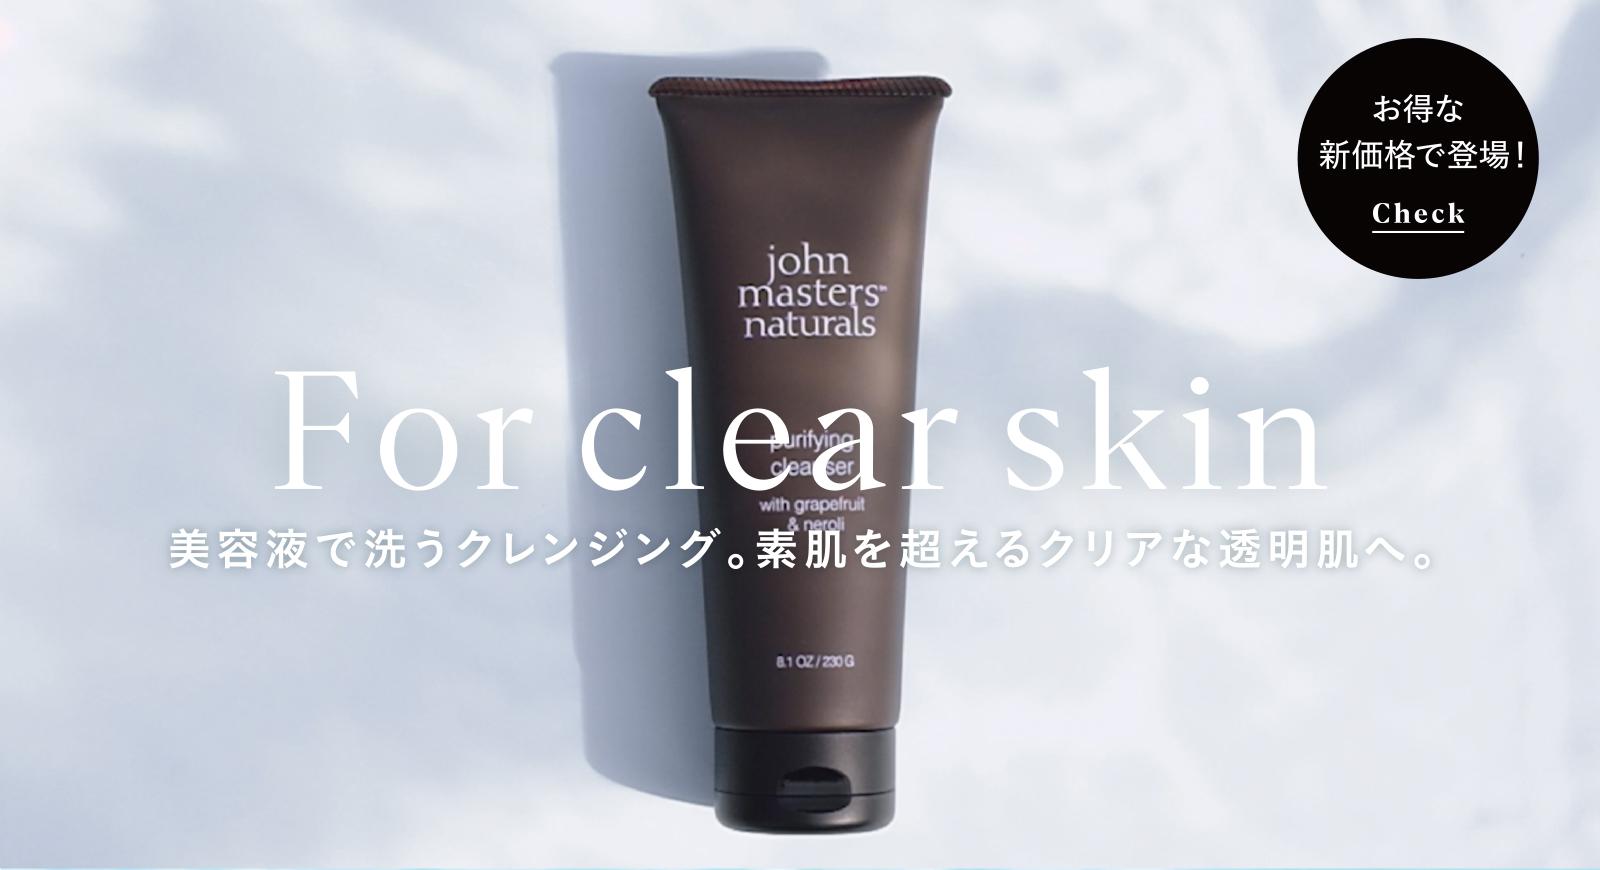 For clear skin 美容液で洗うクレンジング。素肌を超えるクリアな透明肌へ。